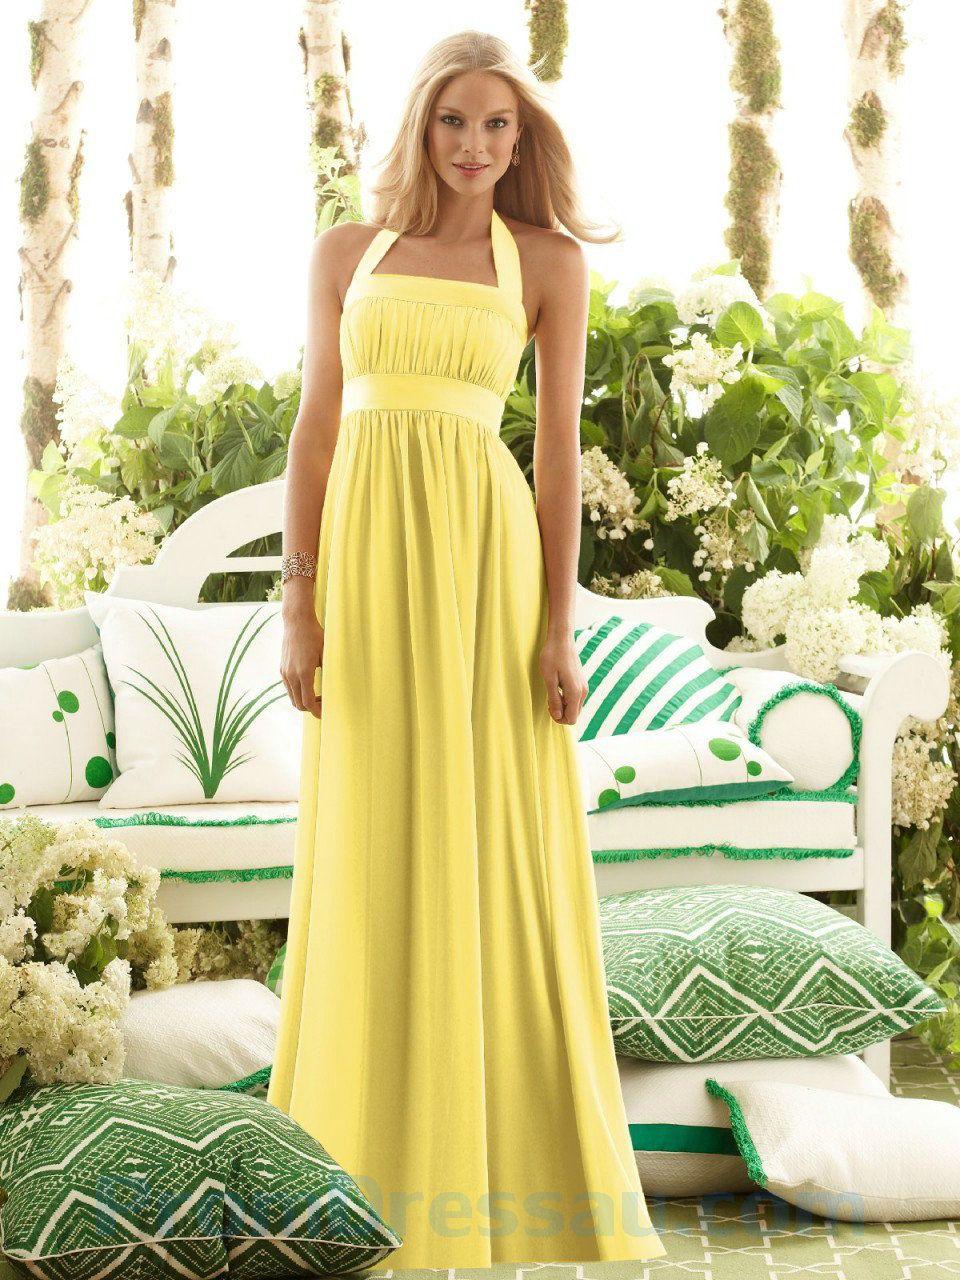 Yellow halter ruffled empire long wedding dress for bridesmaids yellow halter ruffled empire long wedding dress for bridesmaids ombrellifo Choice Image